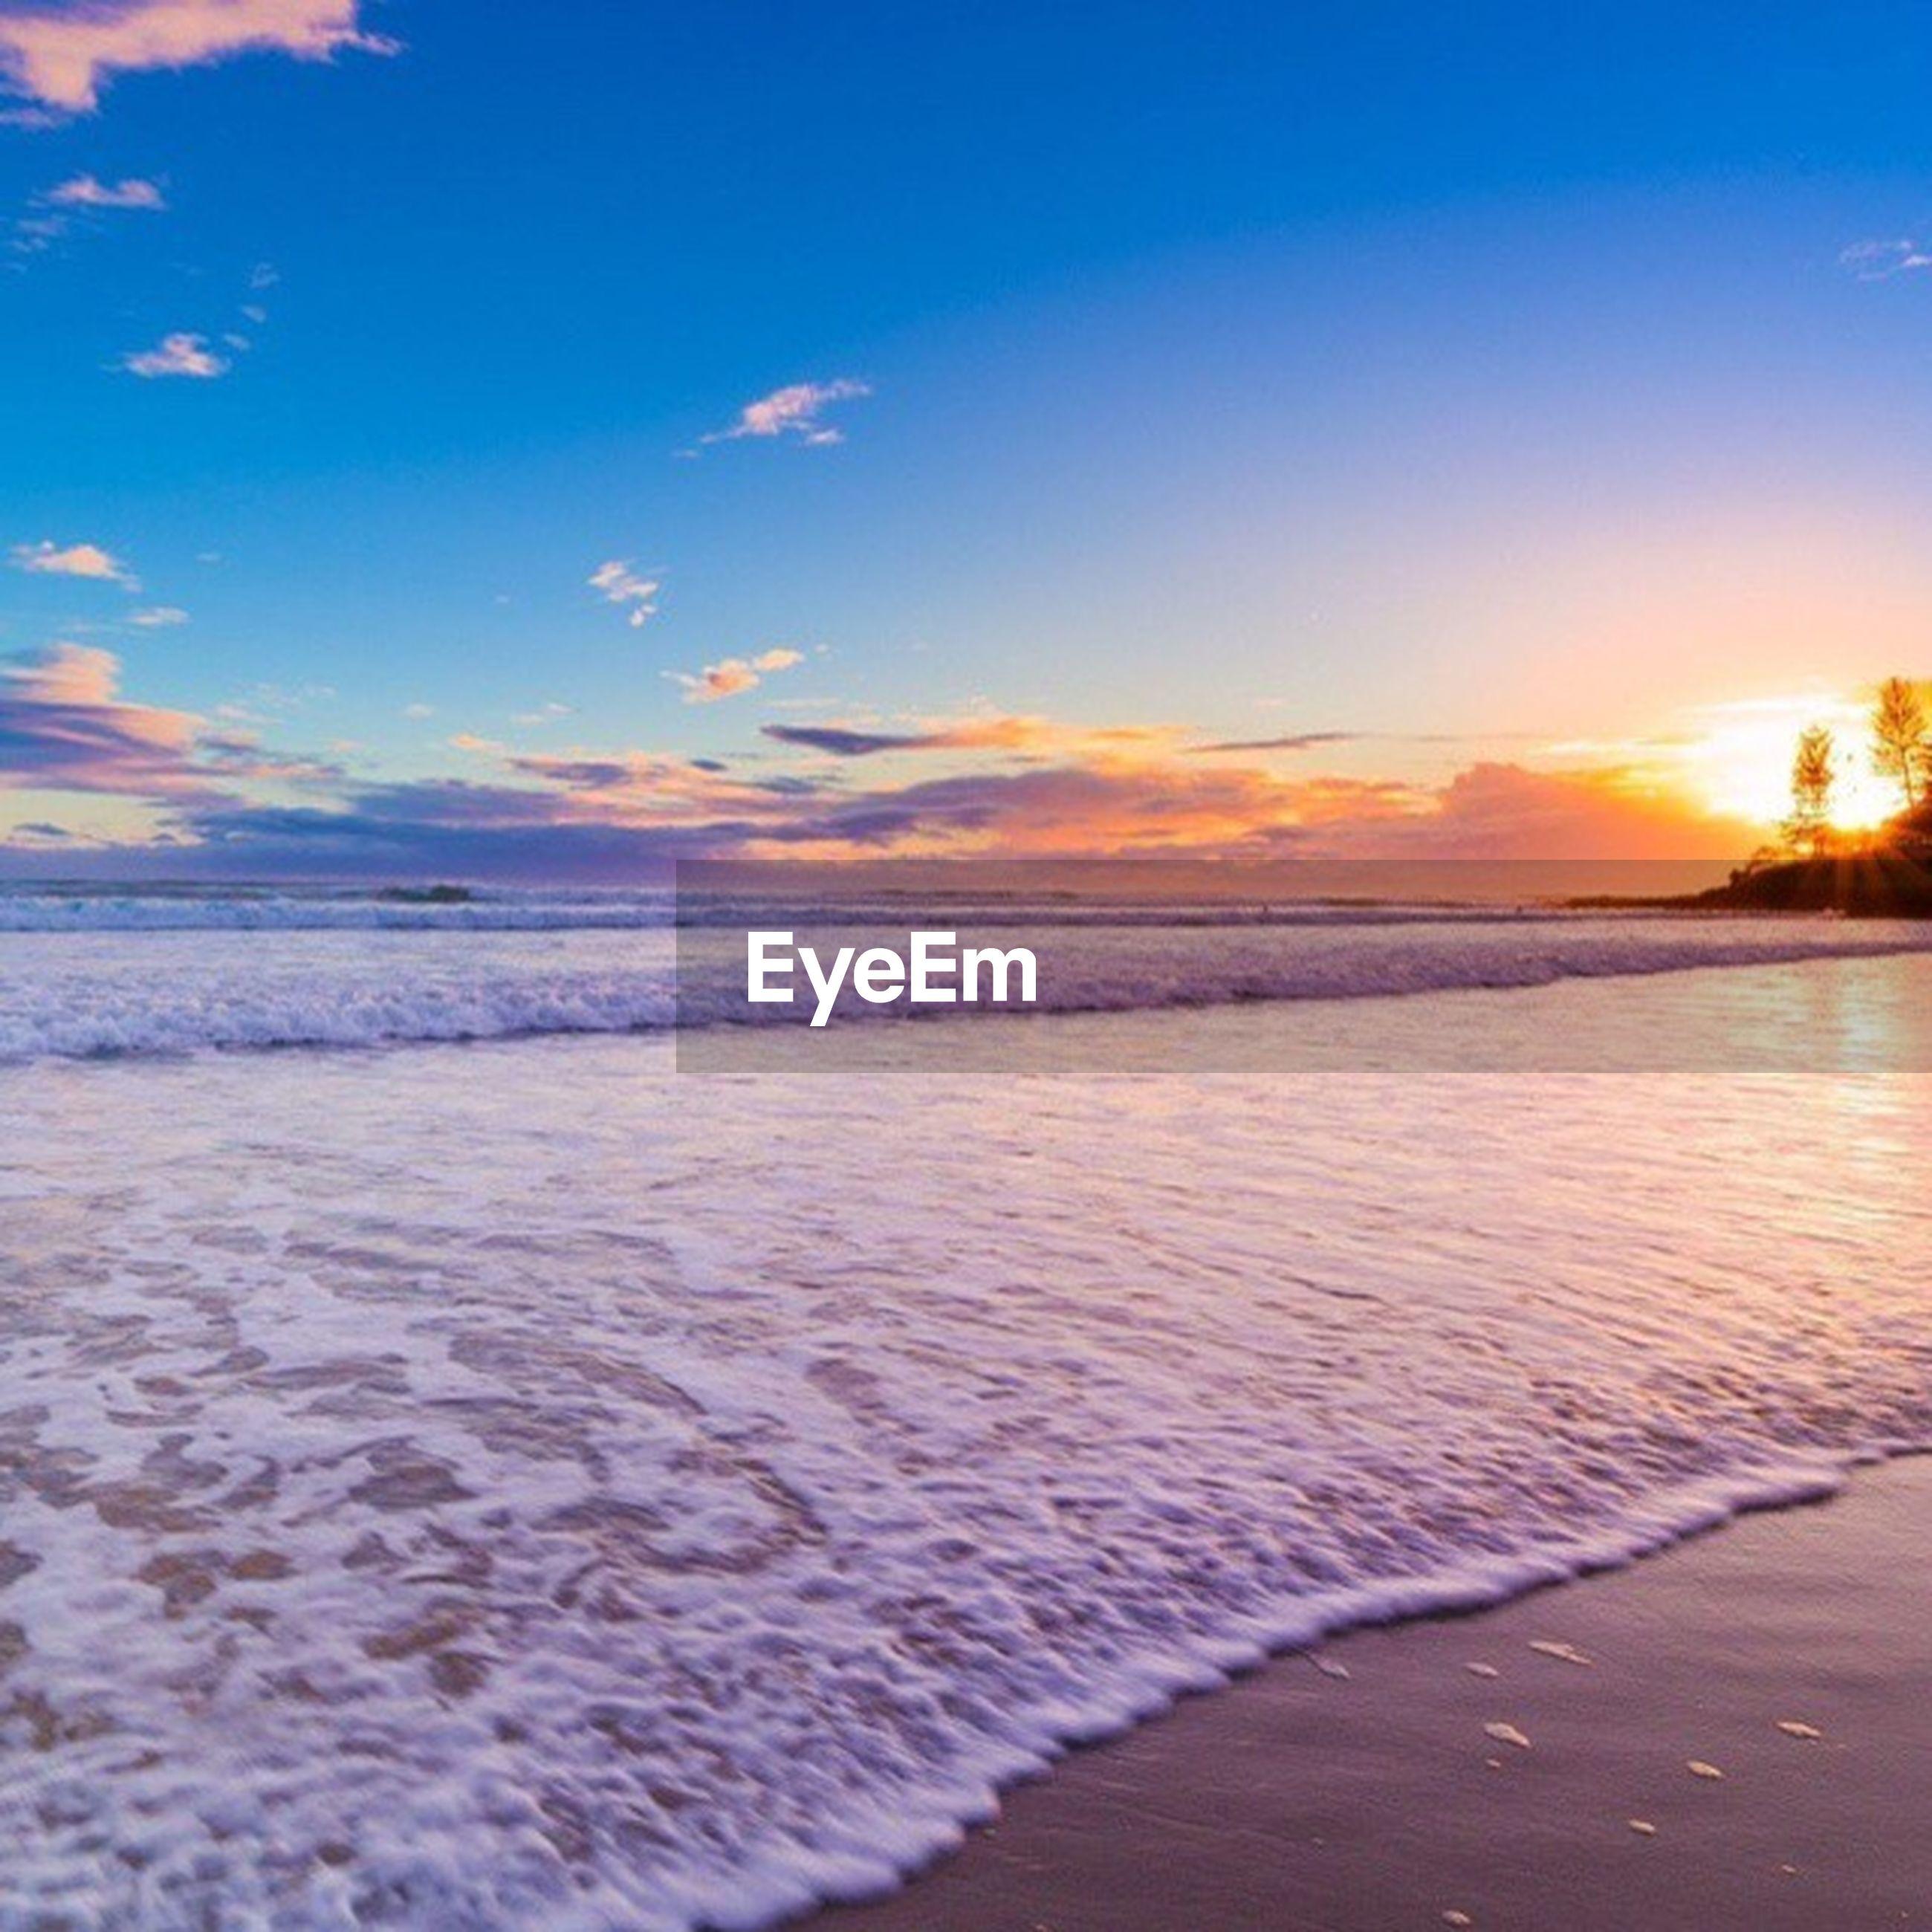 sunset, tranquil scene, scenics, tranquility, cold temperature, snow, water, winter, sky, beauty in nature, nature, beach, sea, idyllic, cloud - sky, season, shore, orange color, frozen, weather